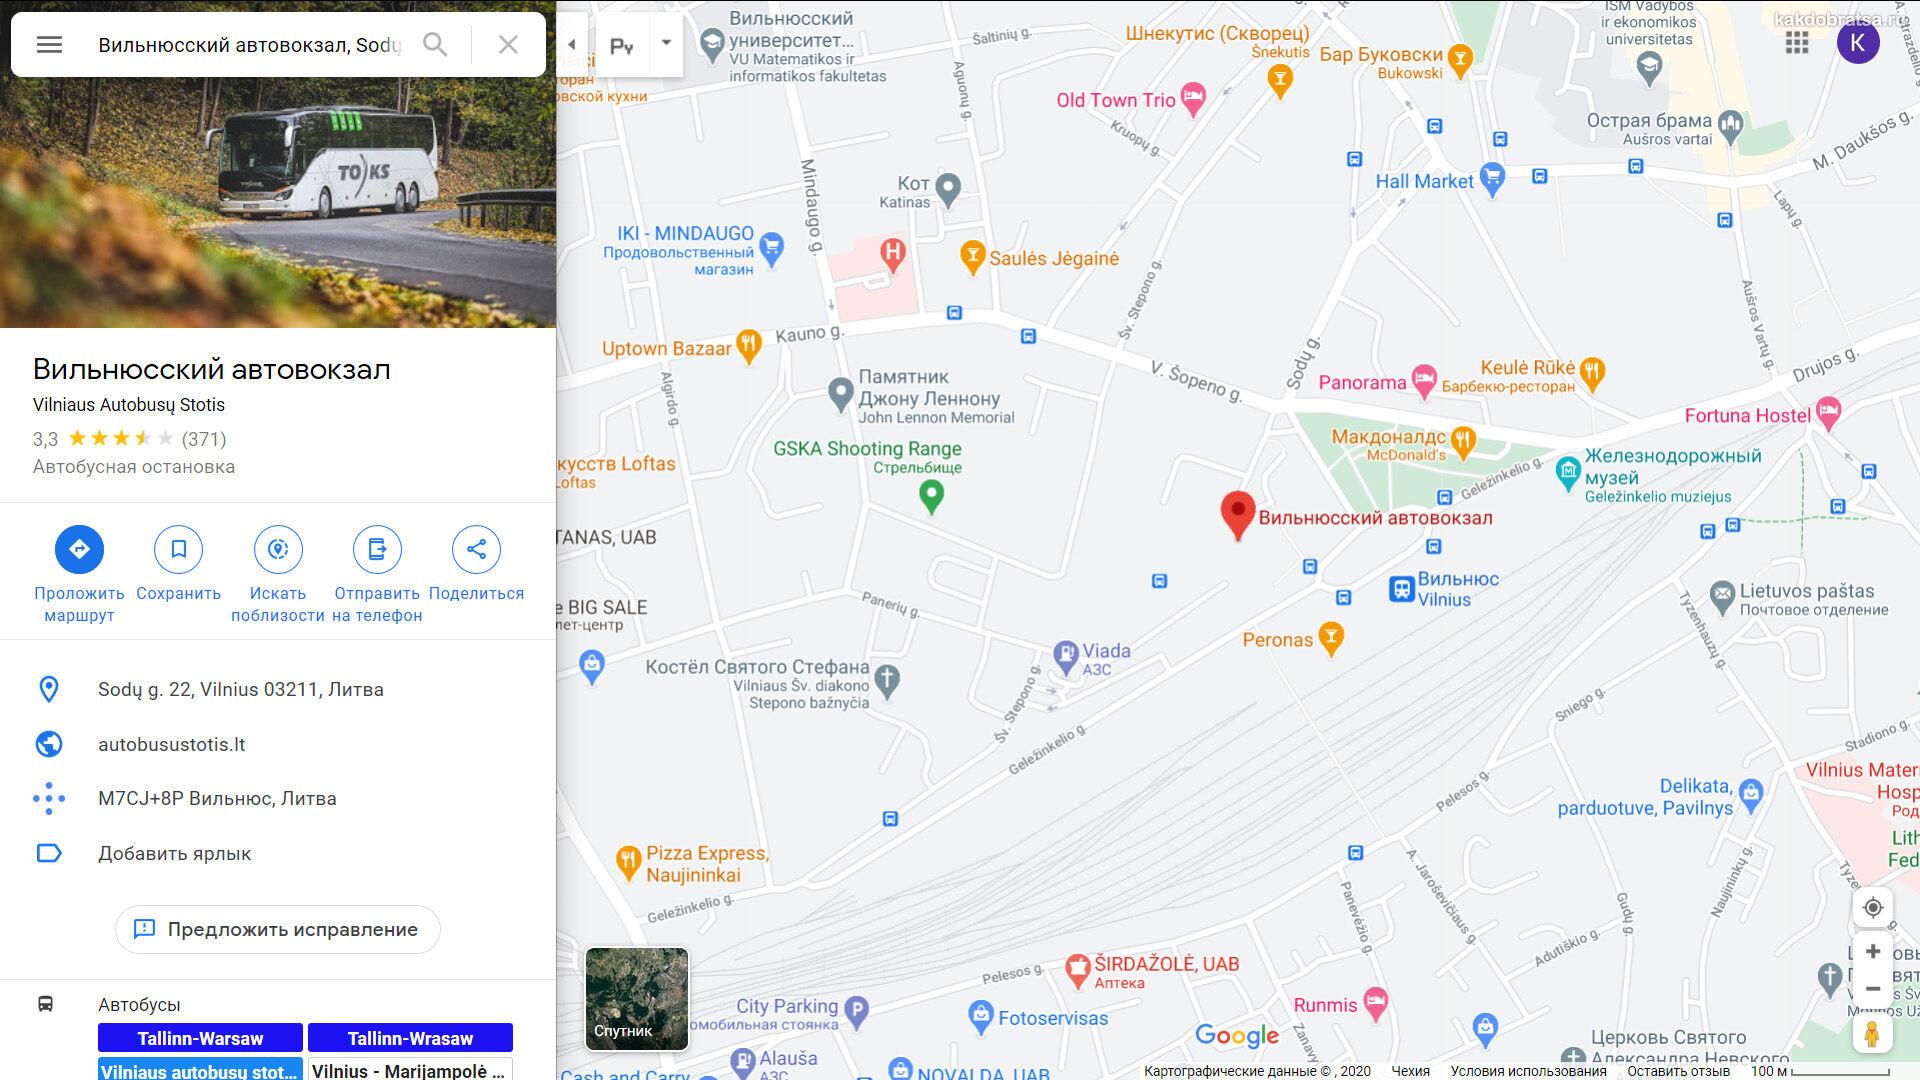 Расположение автовокзала Вильнюса на карте